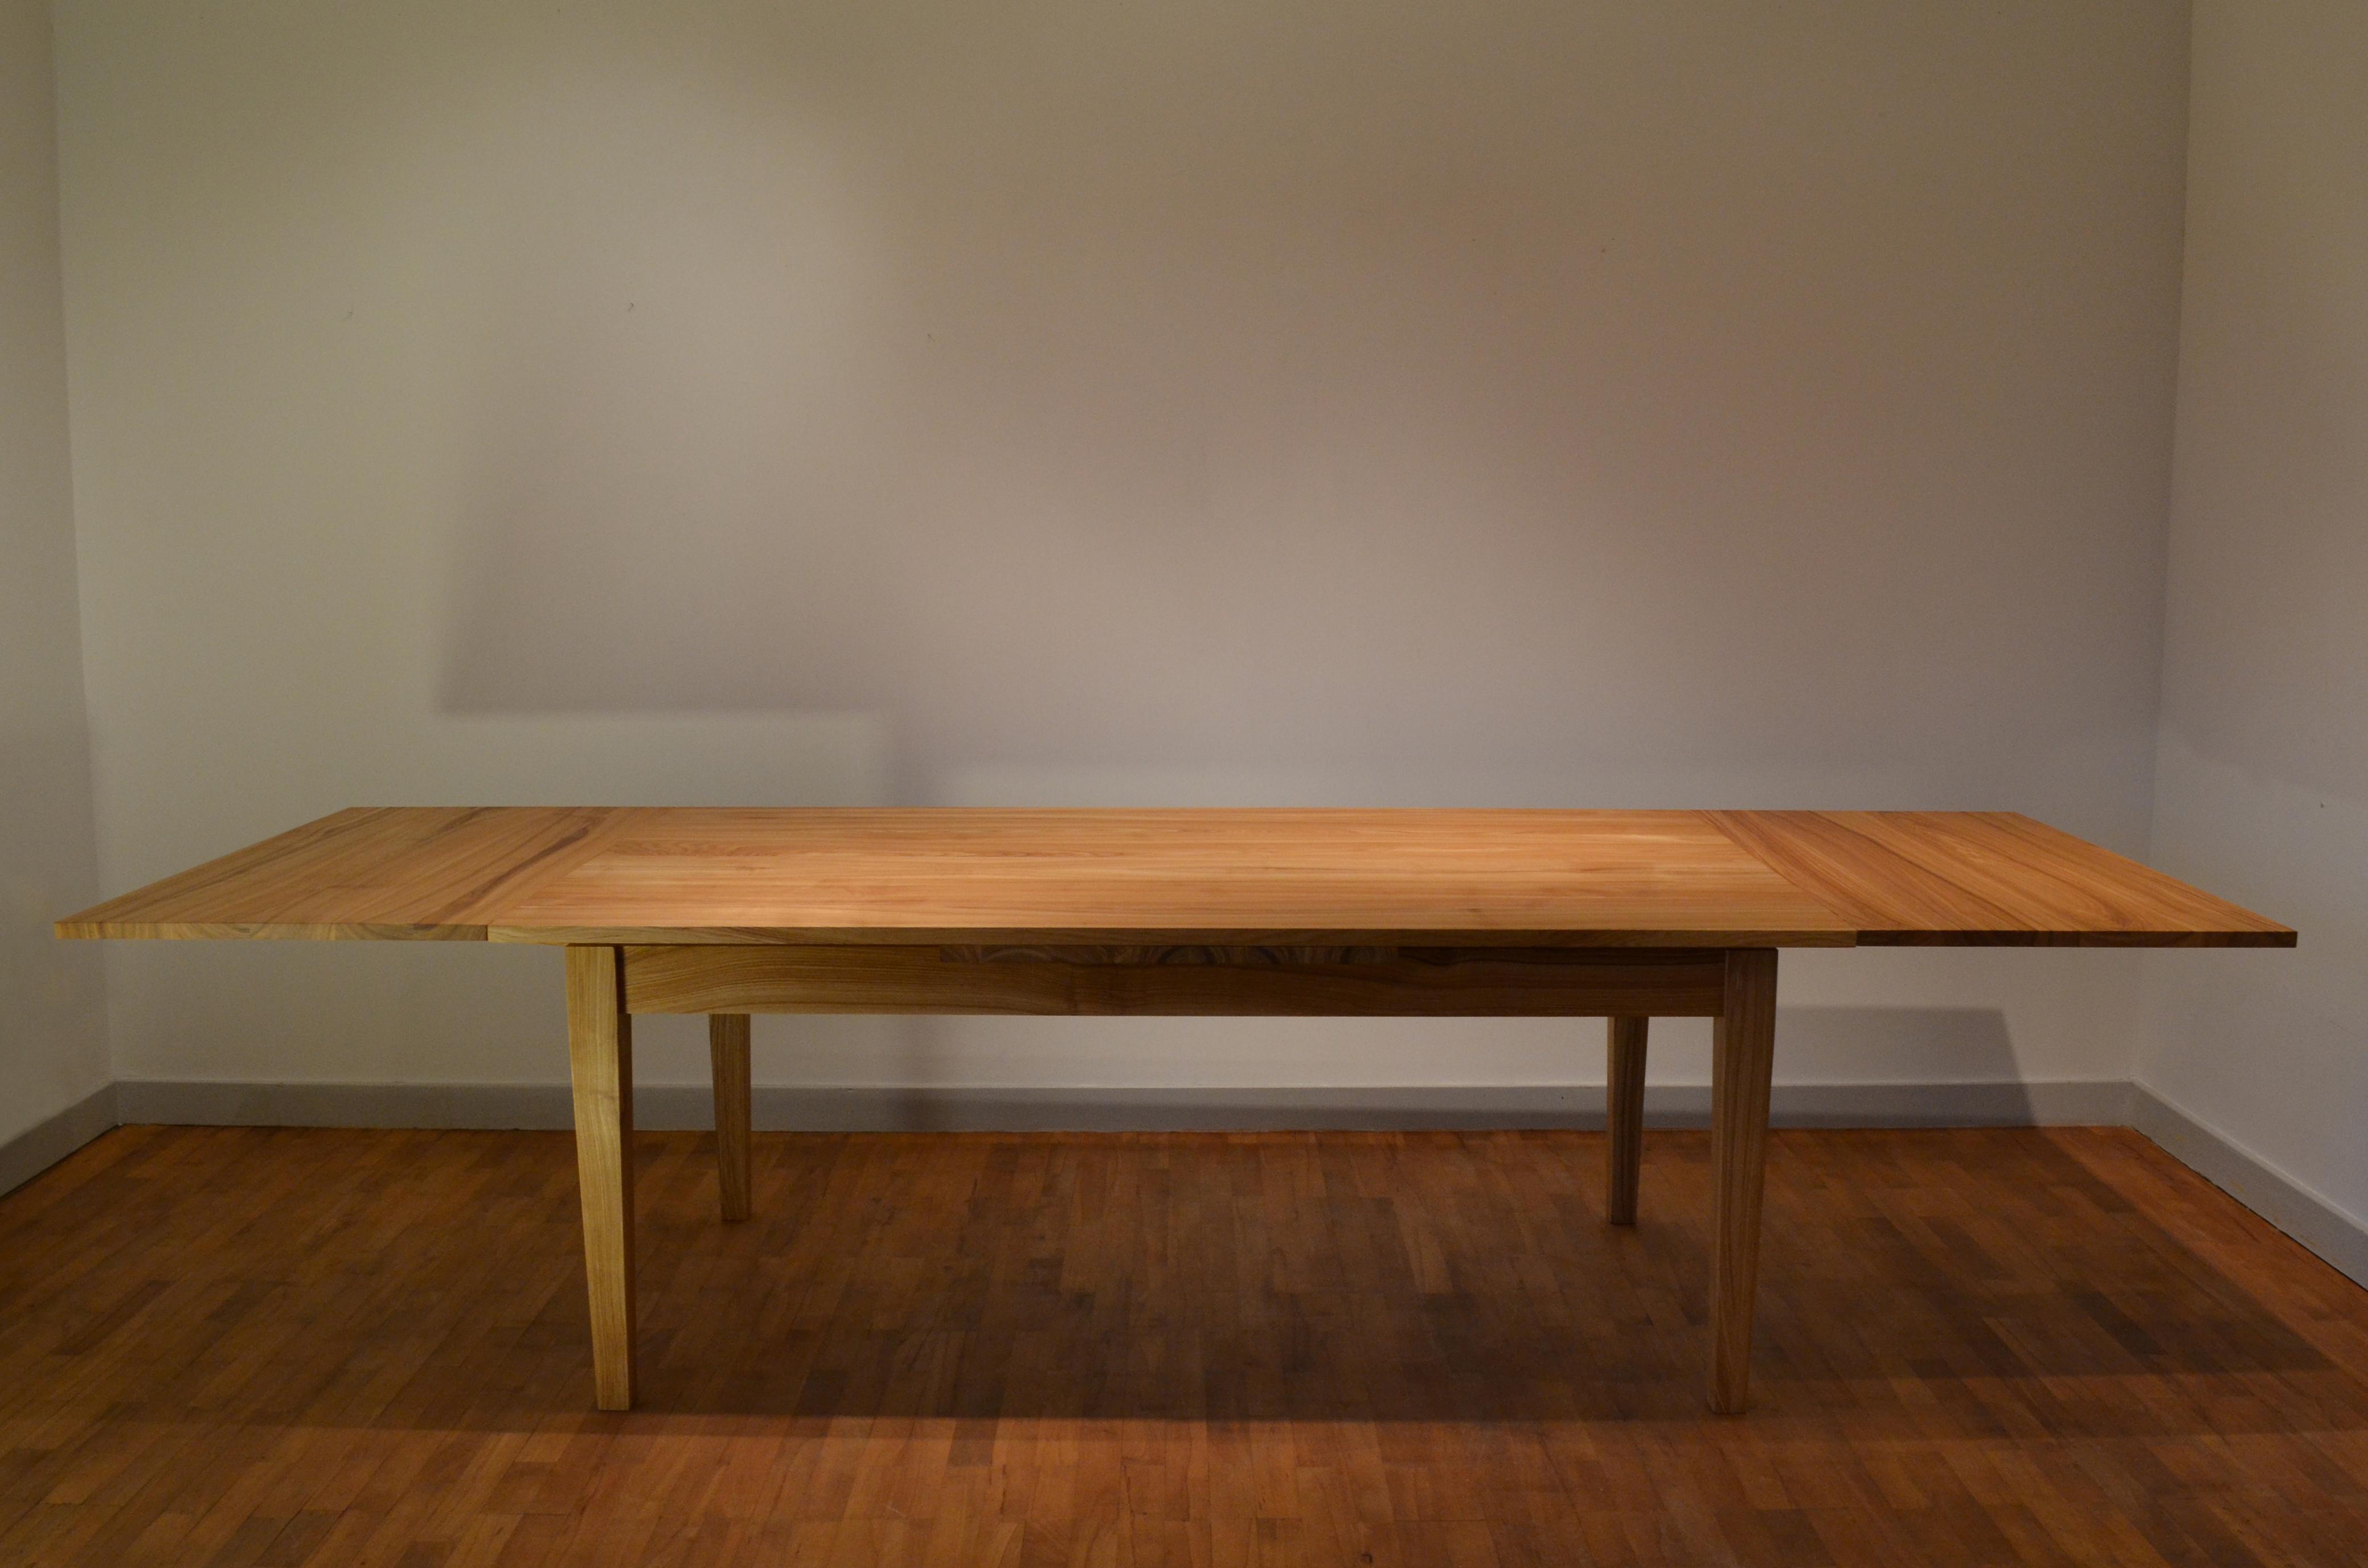 stort matbord 14 personer